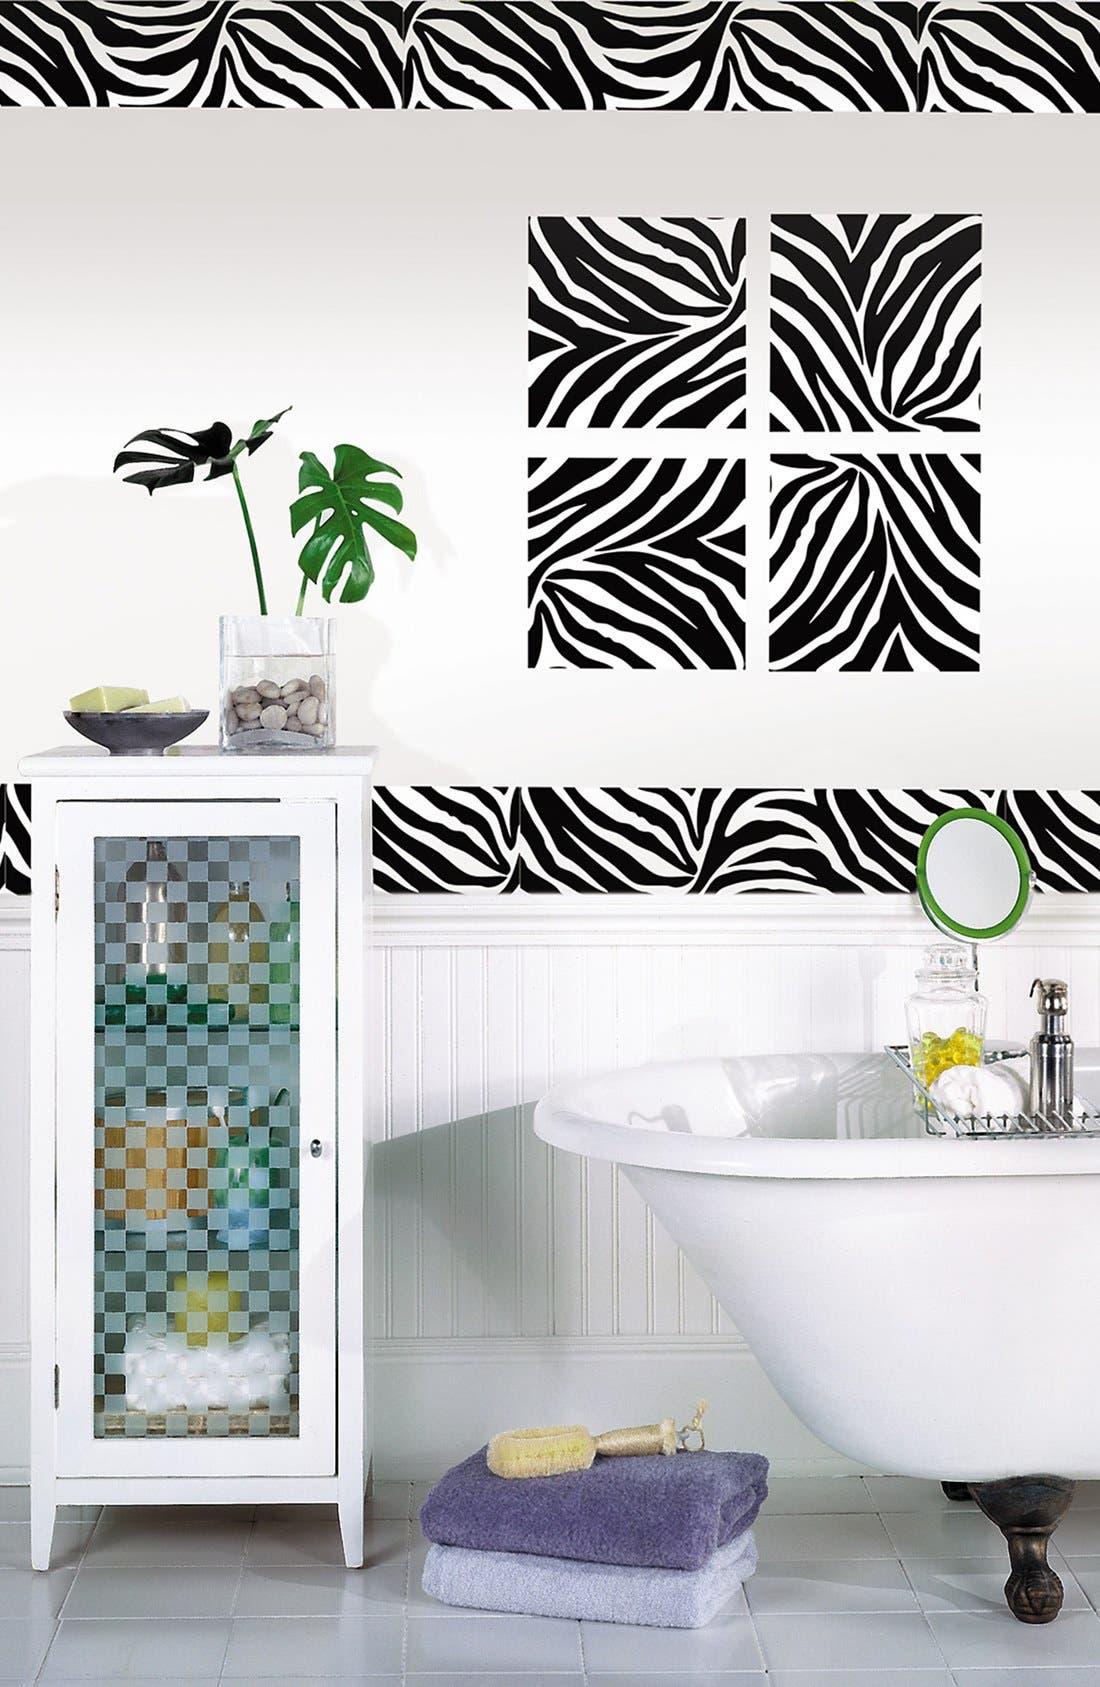 Alternate Image 1 Selected - Wallpops 'Go Wild Zebra Blox & Stripes' Wall Art